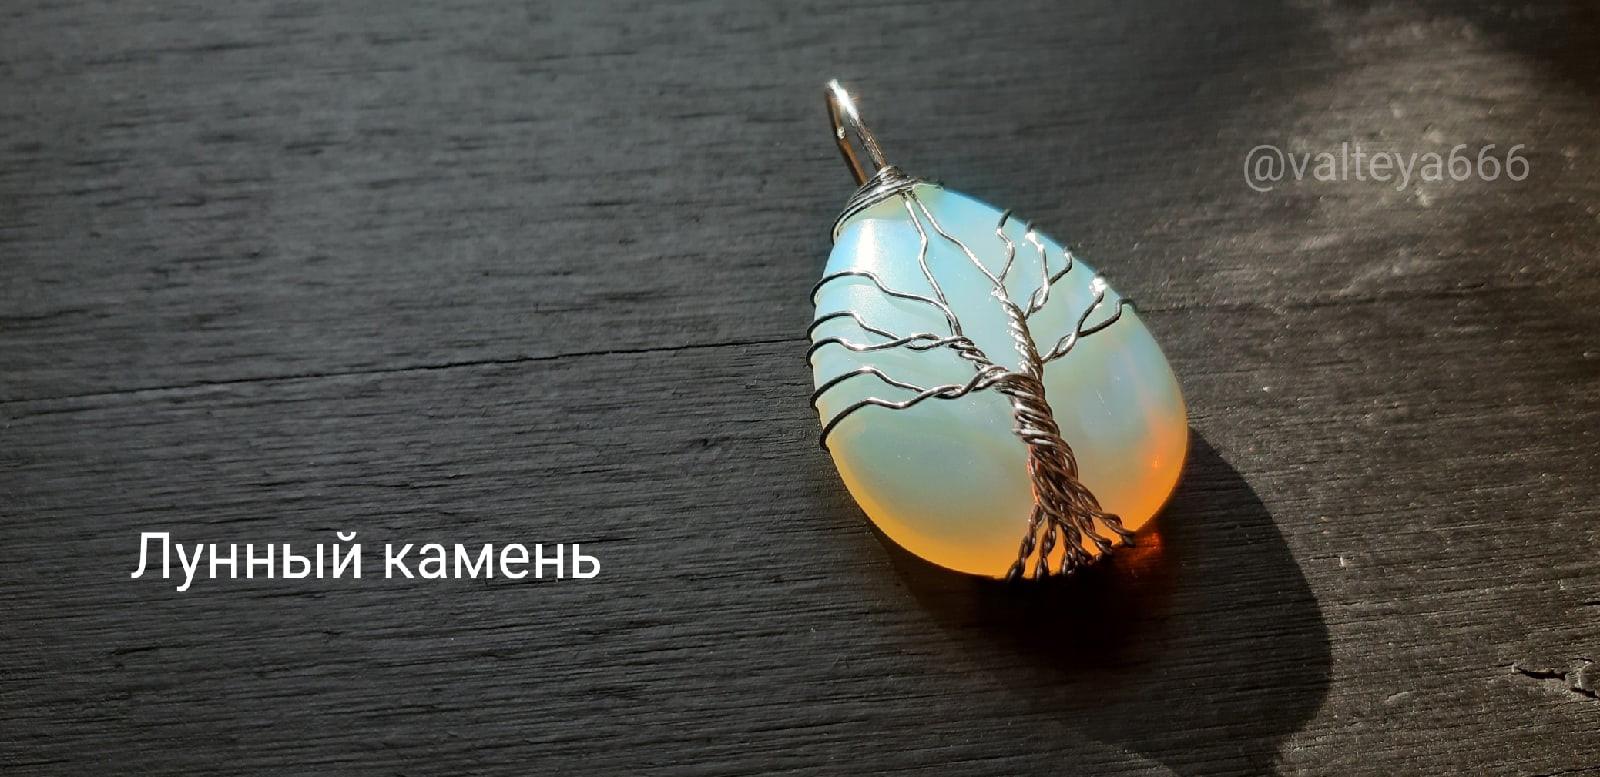 Украина - Натуальные камни. Талисманы, амулеты из натуральных камней - Страница 3 KXQ5Ch_GPNY